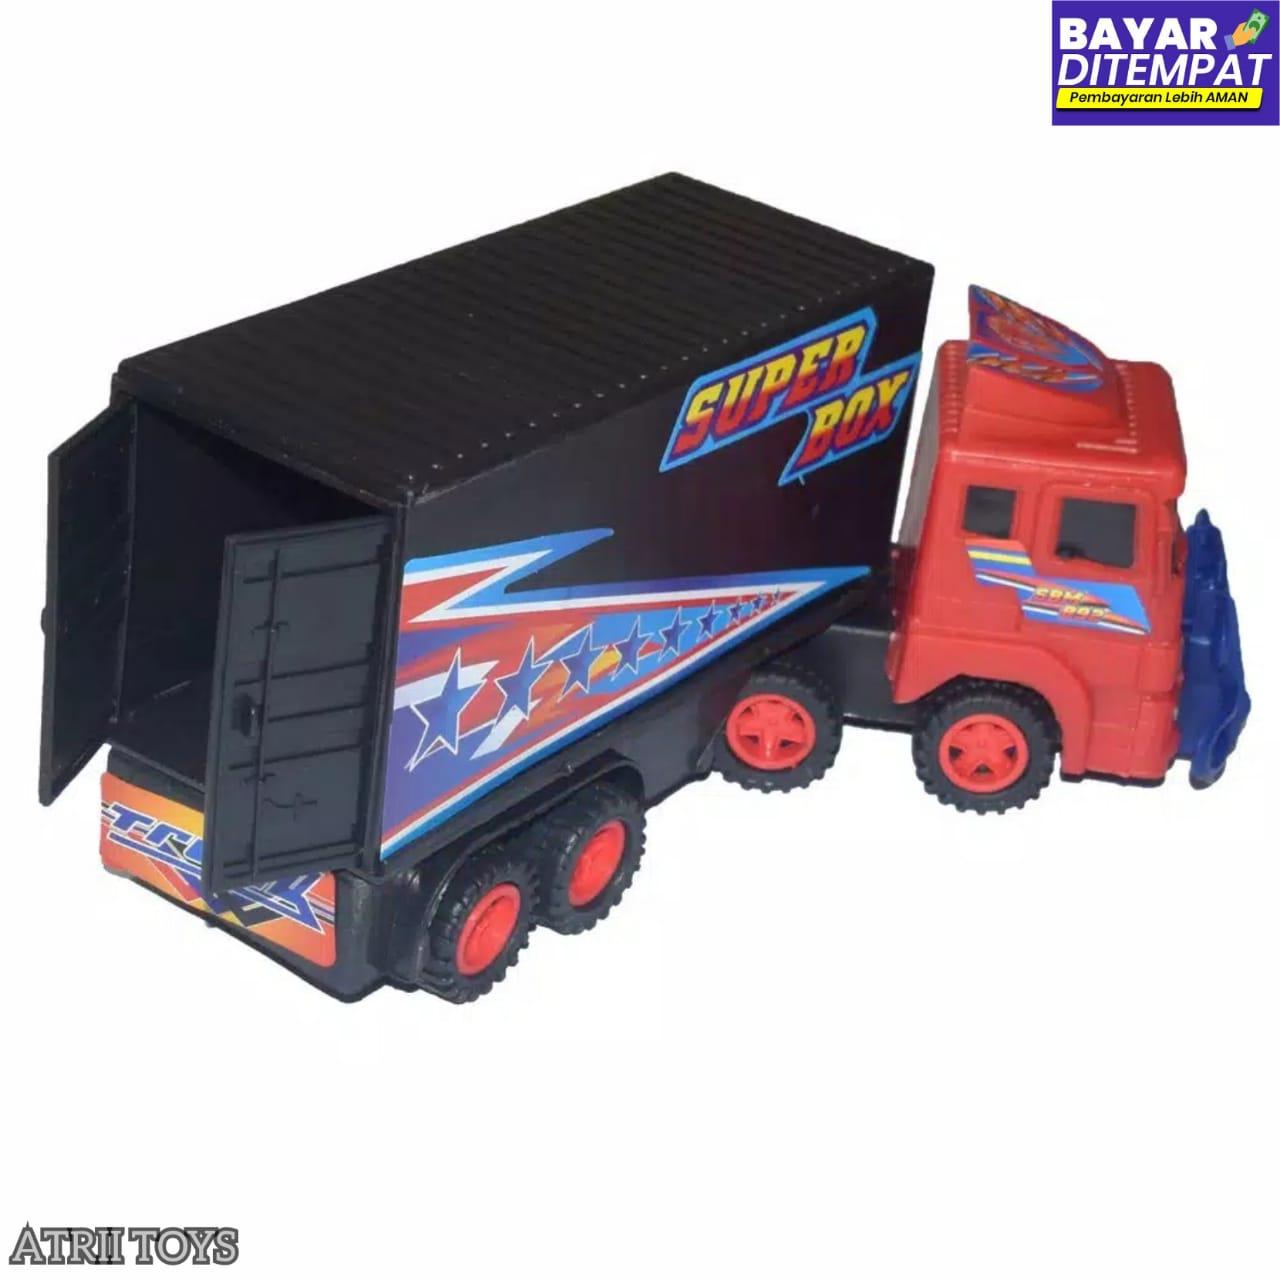 Mainan Mobil Box Container Diecast Alat Berat Murah Mainan Mobil Truck Box Mainan Mobil Super Box Mainan Edukasi Anak Lazada Indonesia